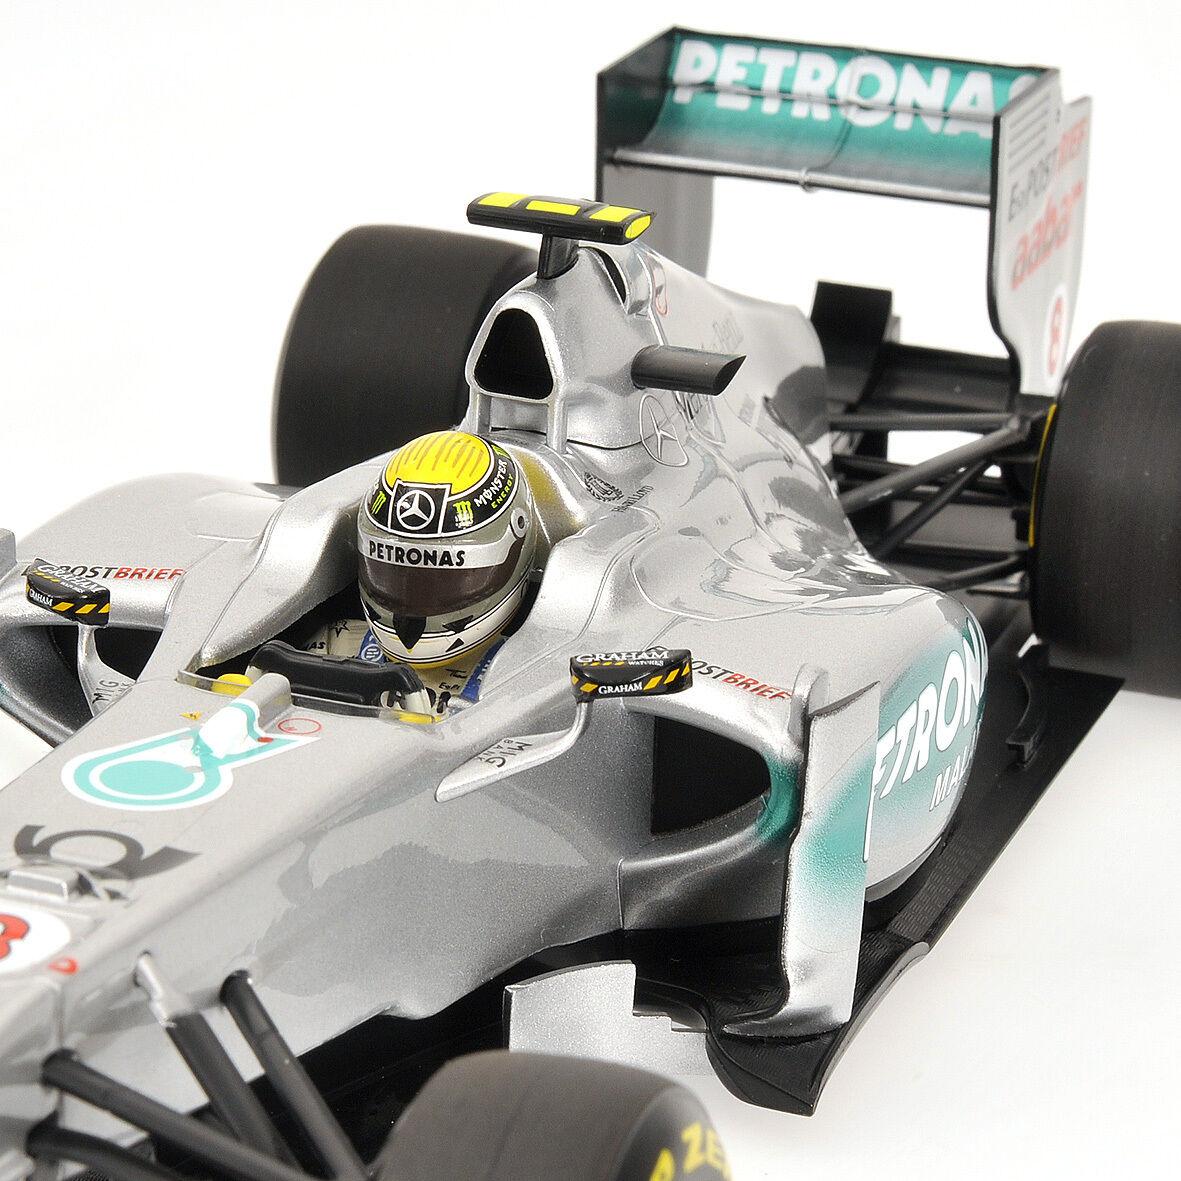 Formula 1 mercedes mgp w02 n. rosberg 2011 minichamps 1  18  pas cher et de la mode